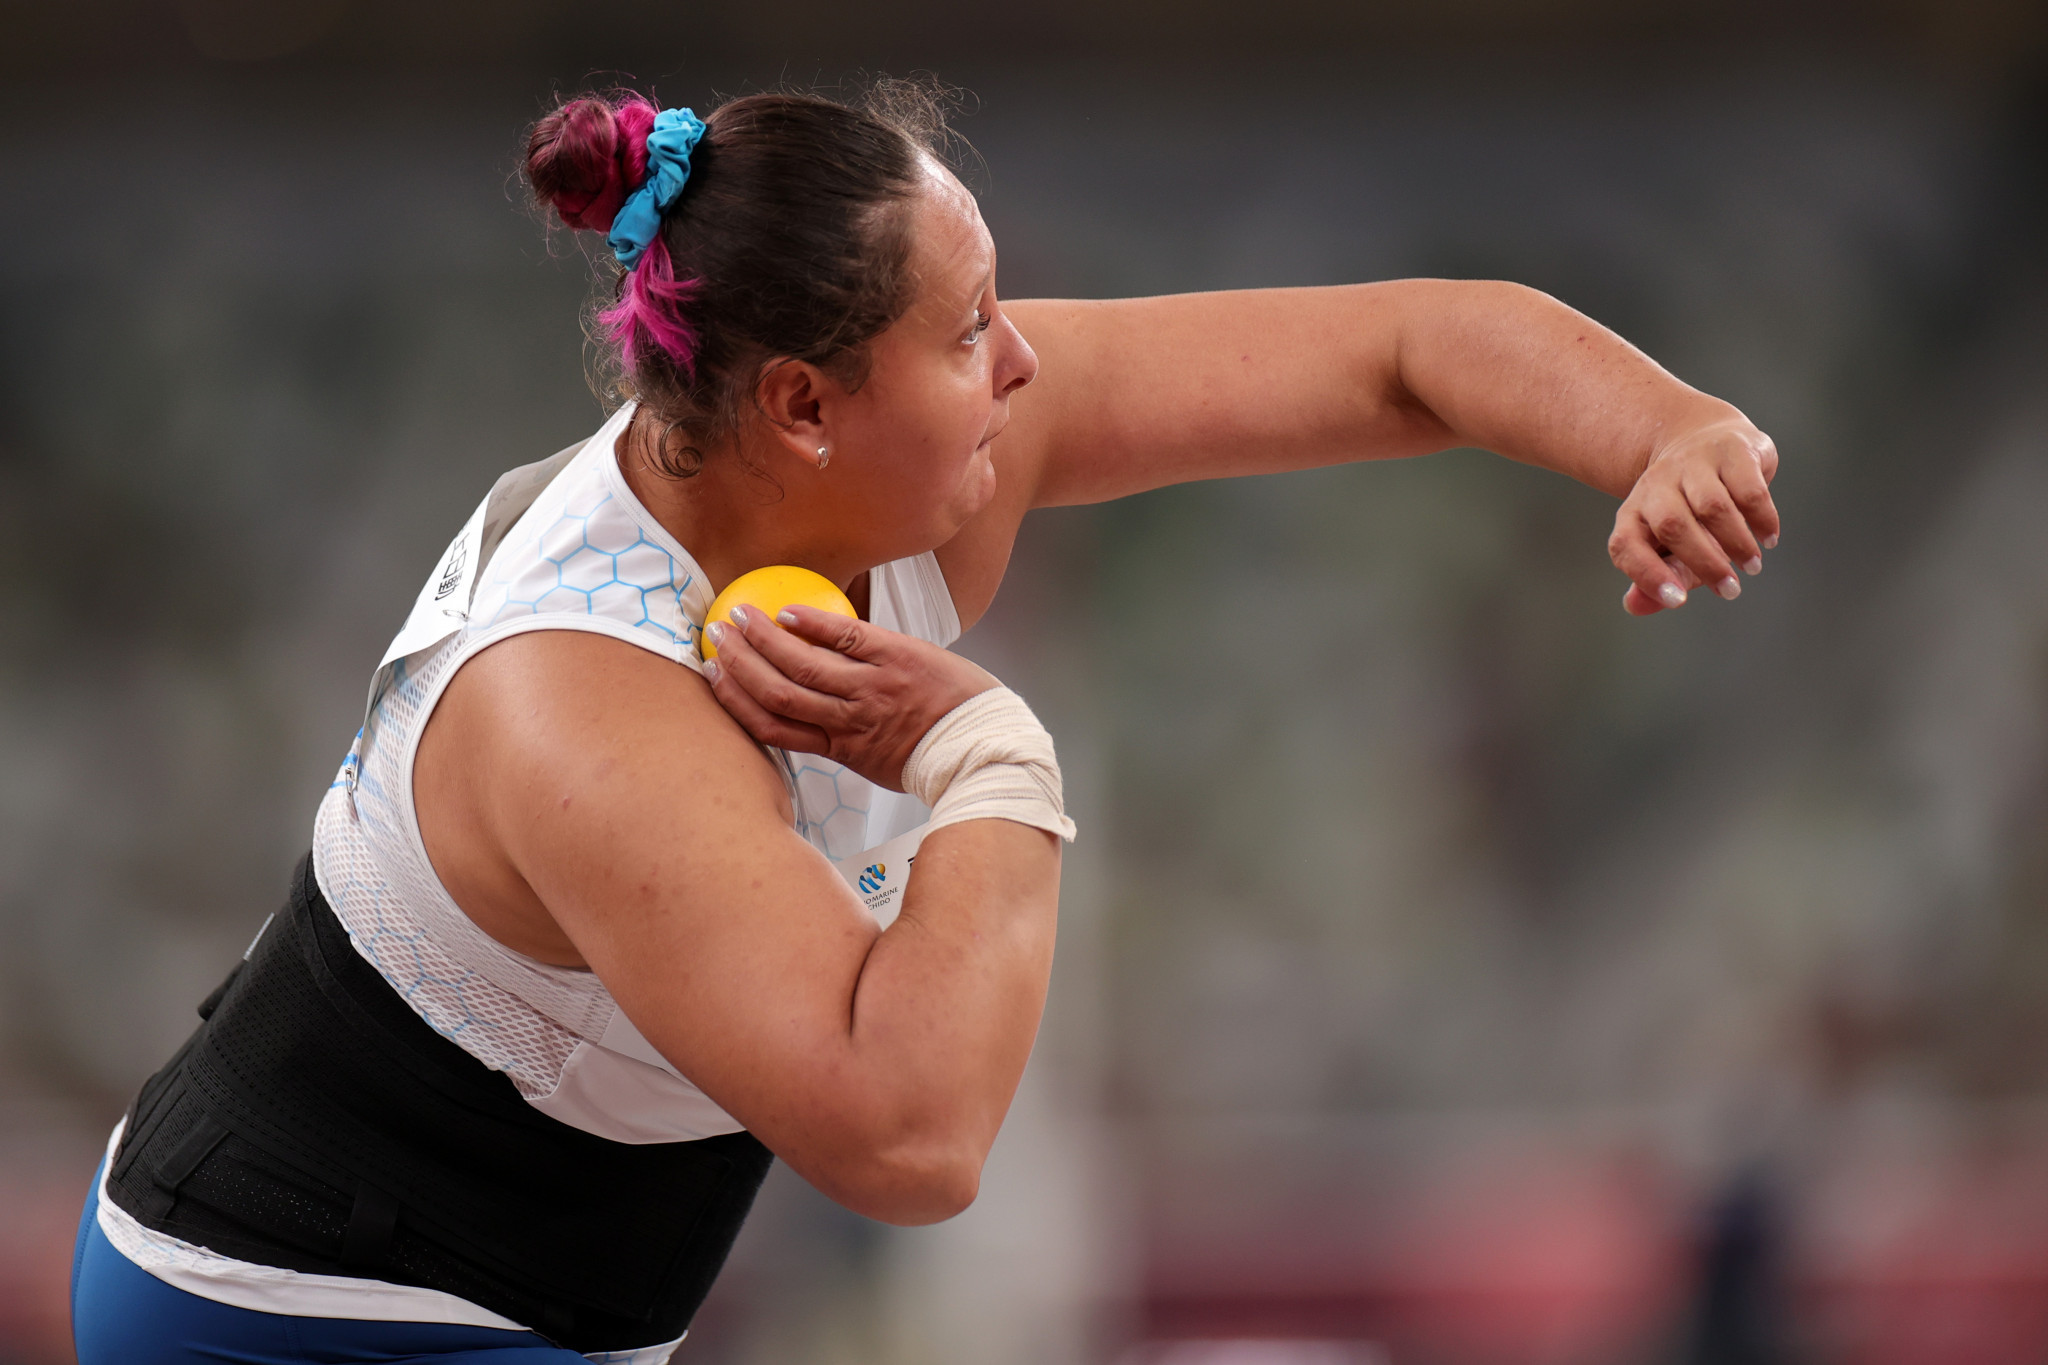 Galina Lipatnikova threw a personal best 11.03m to clinch gold in the women's F36 shot put ©Getty Images